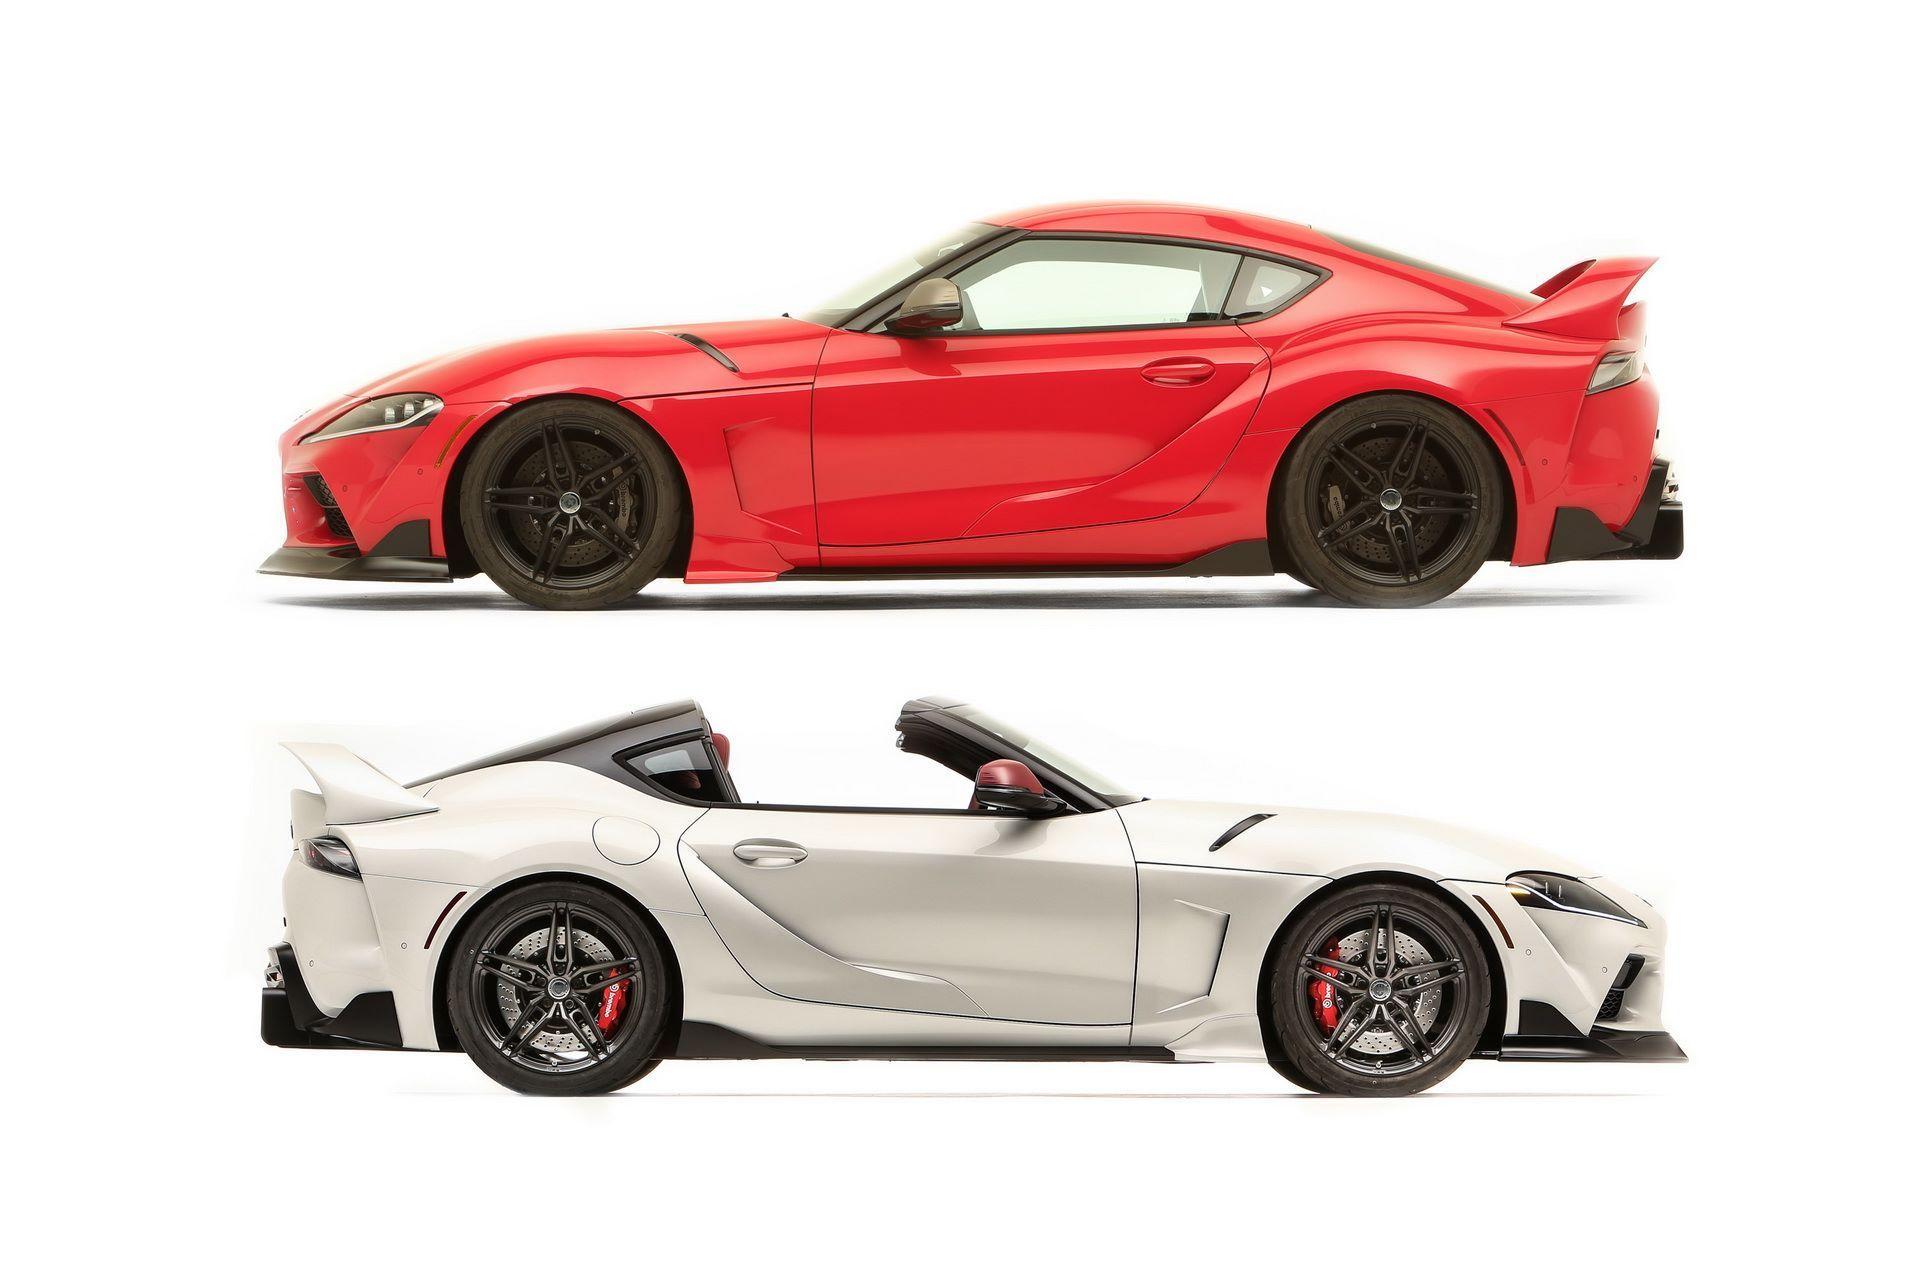 toyota-sema-2020-new-cars-2